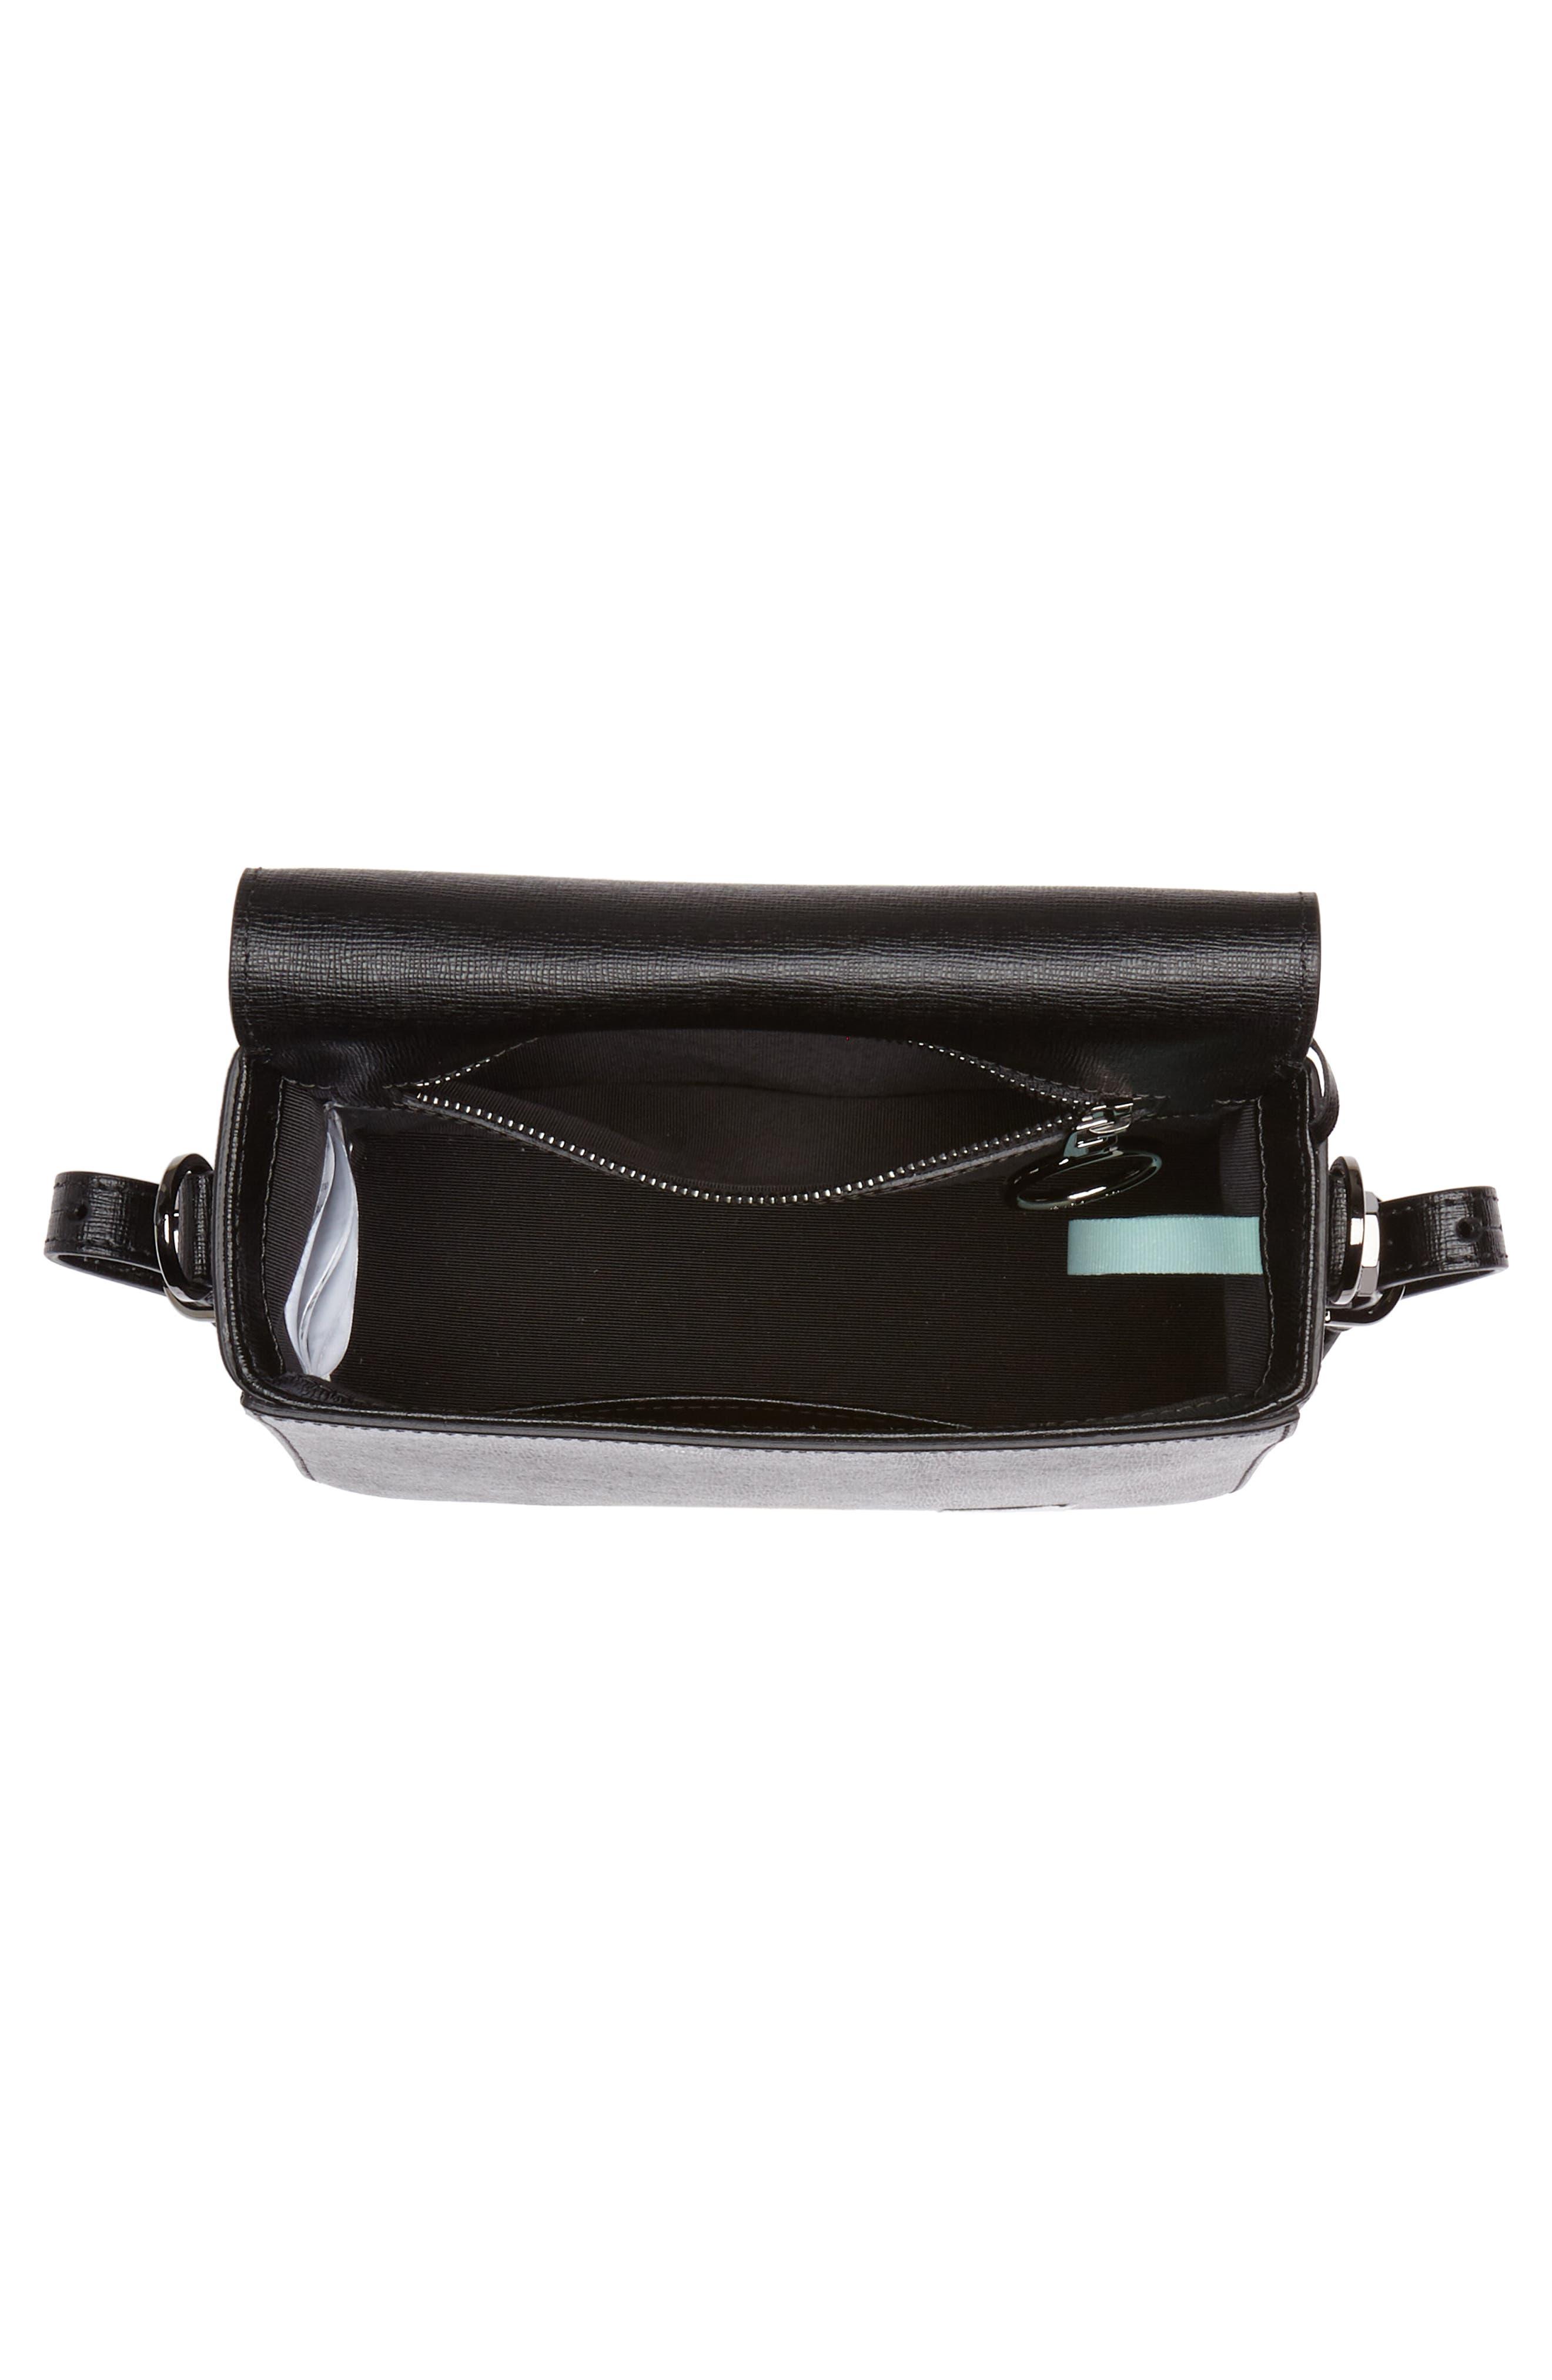 Binder Clip Leather Flap Bag,                             Alternate thumbnail 5, color,                             Black